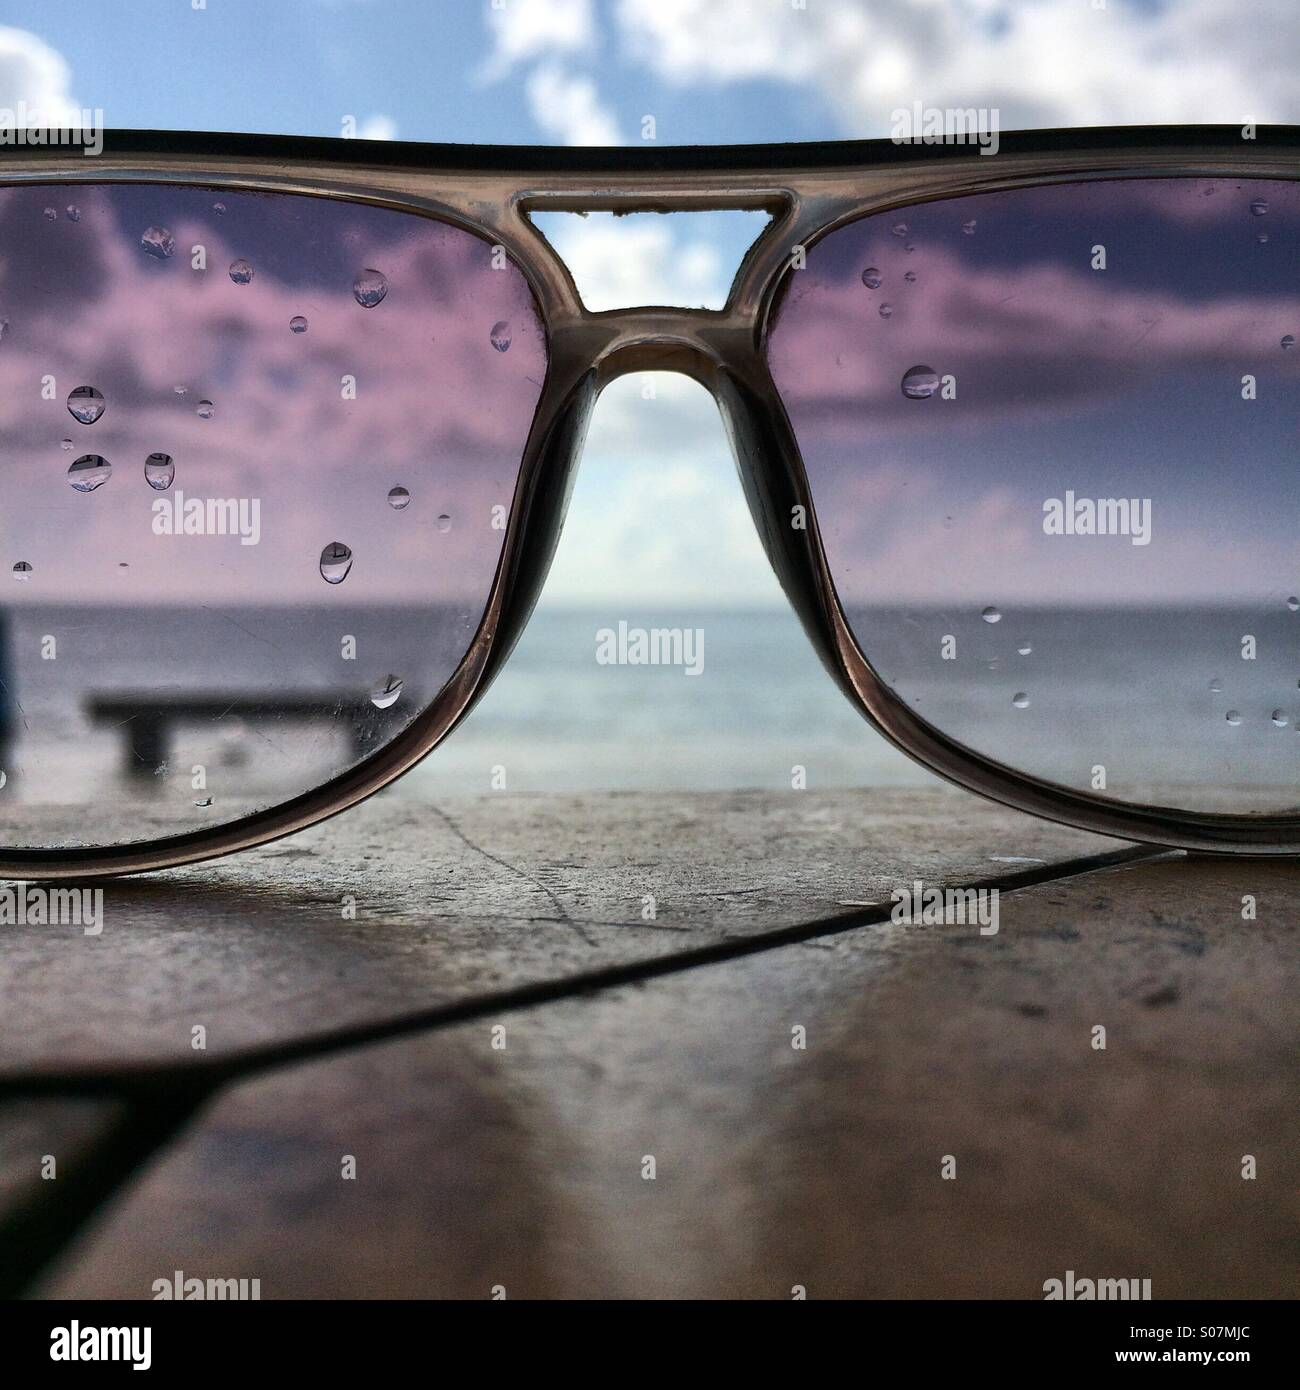 The sea thru rain soaked sunglasses - Stock Image